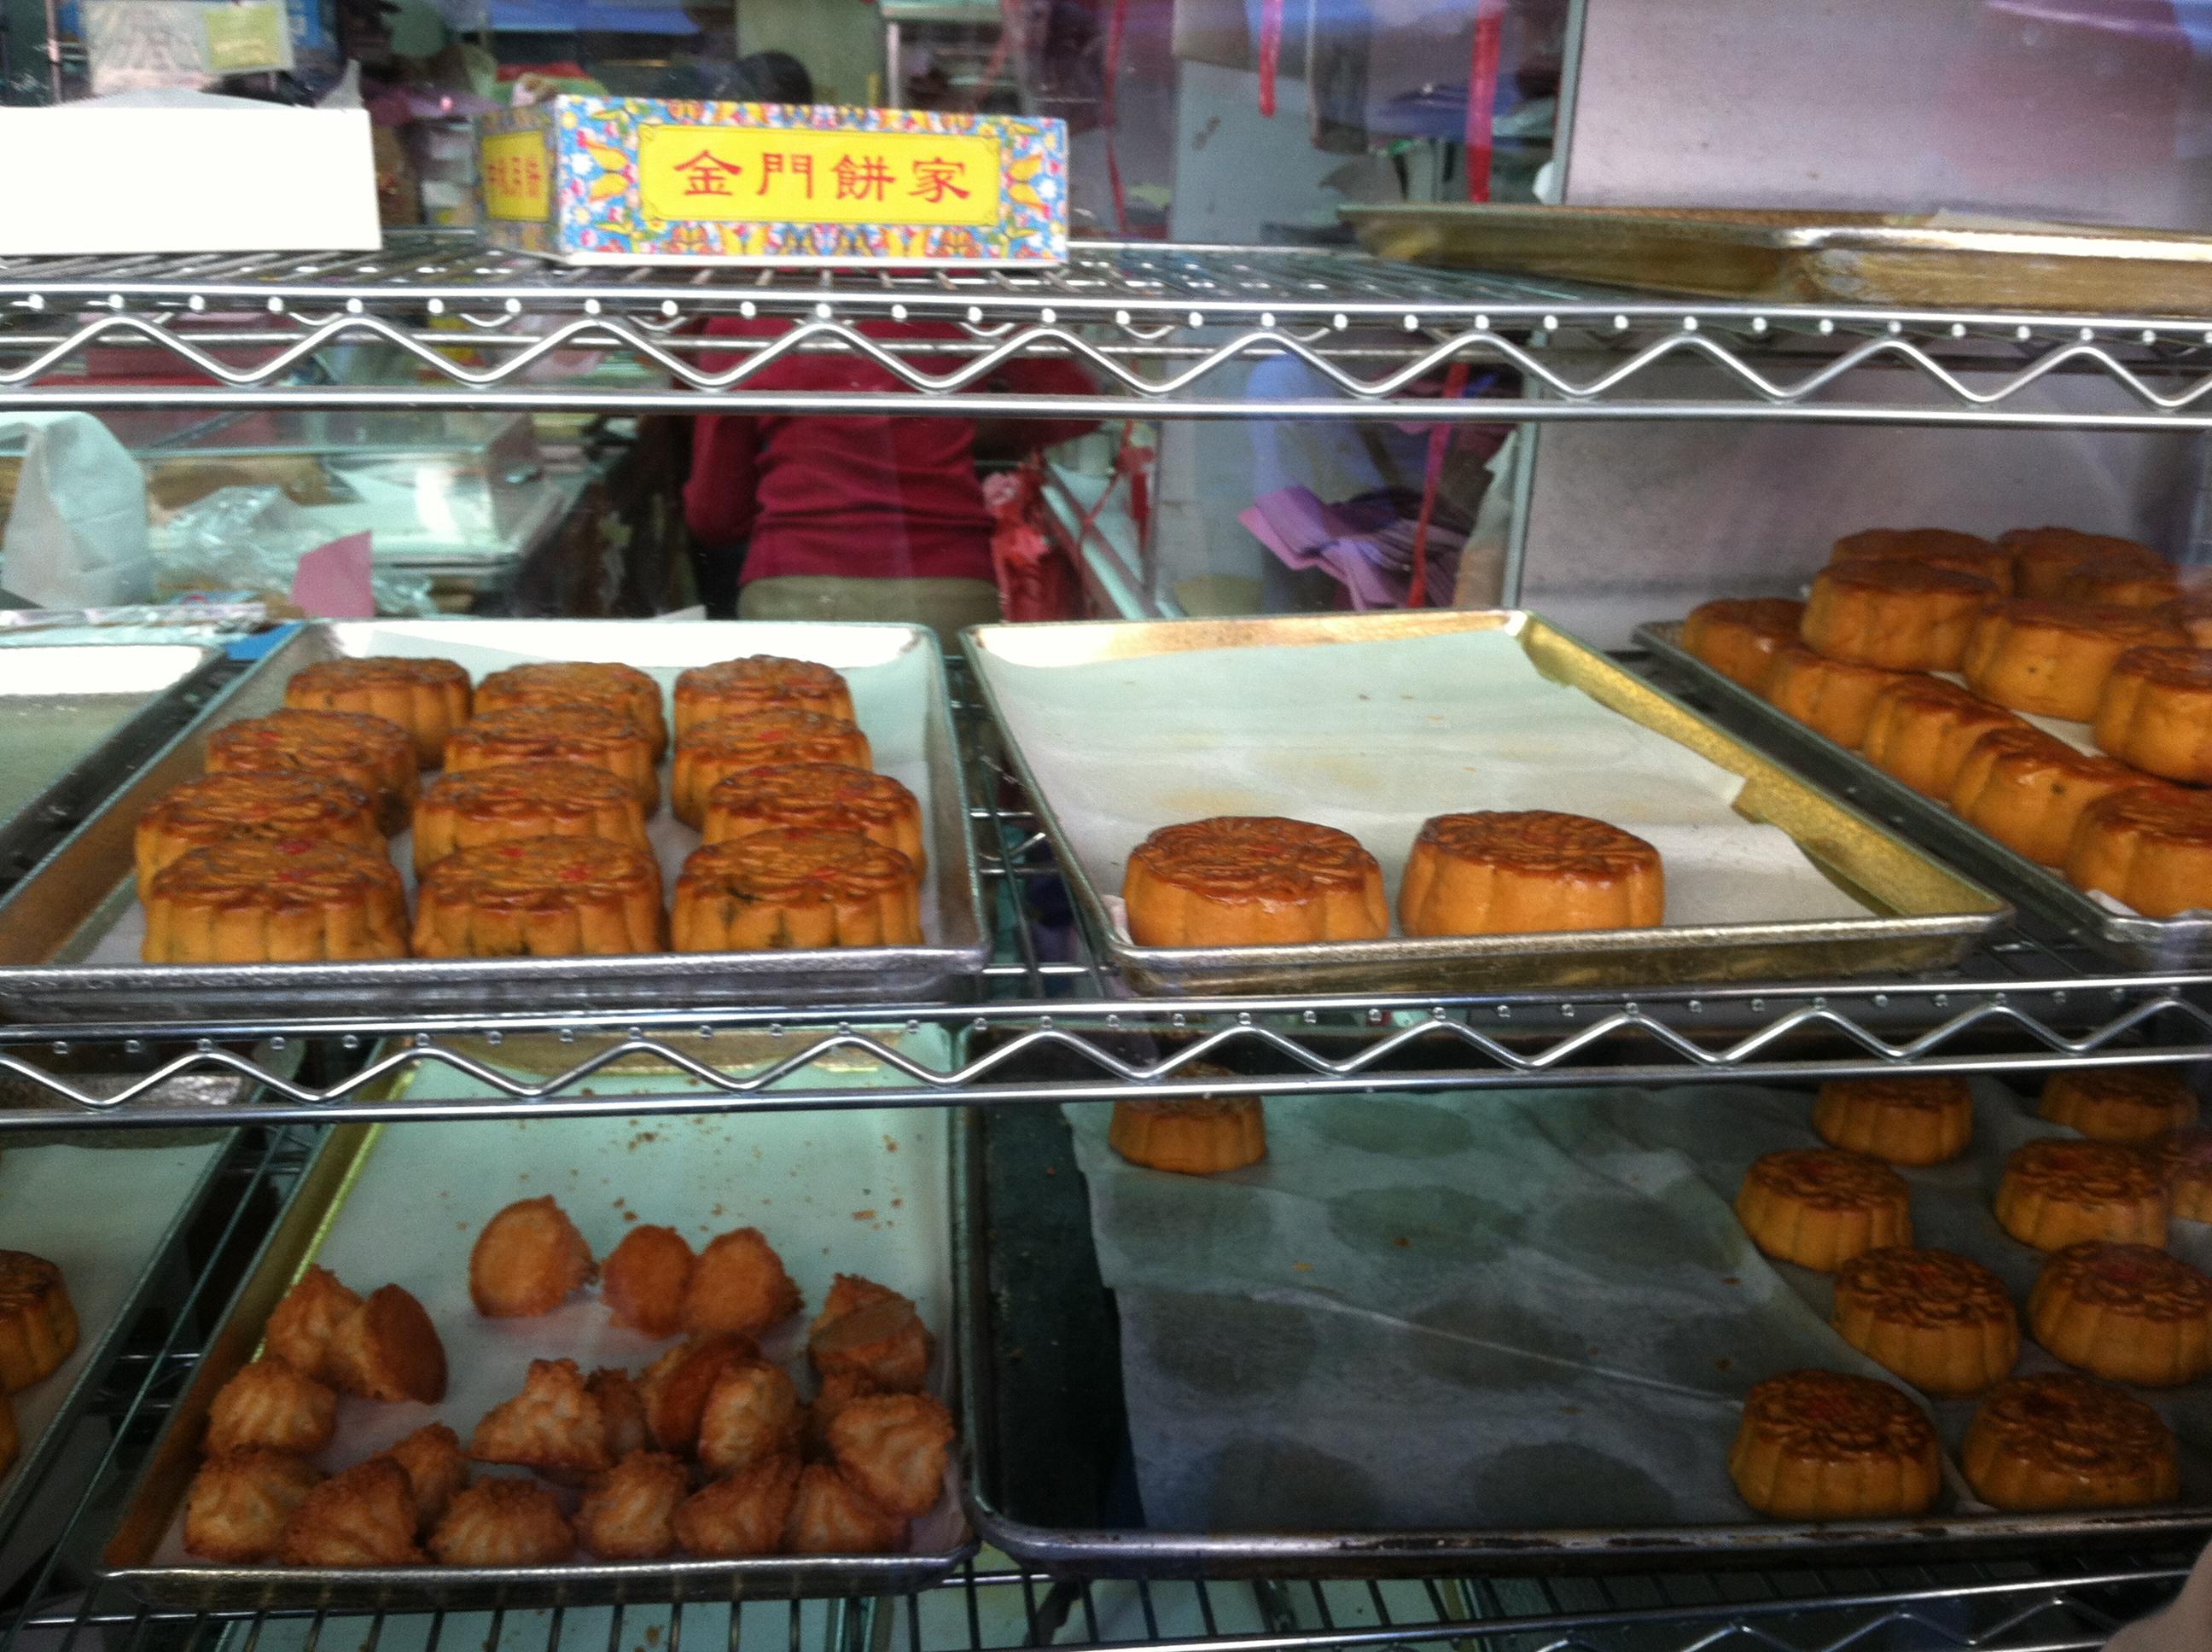 chinese bakery mooncake window display